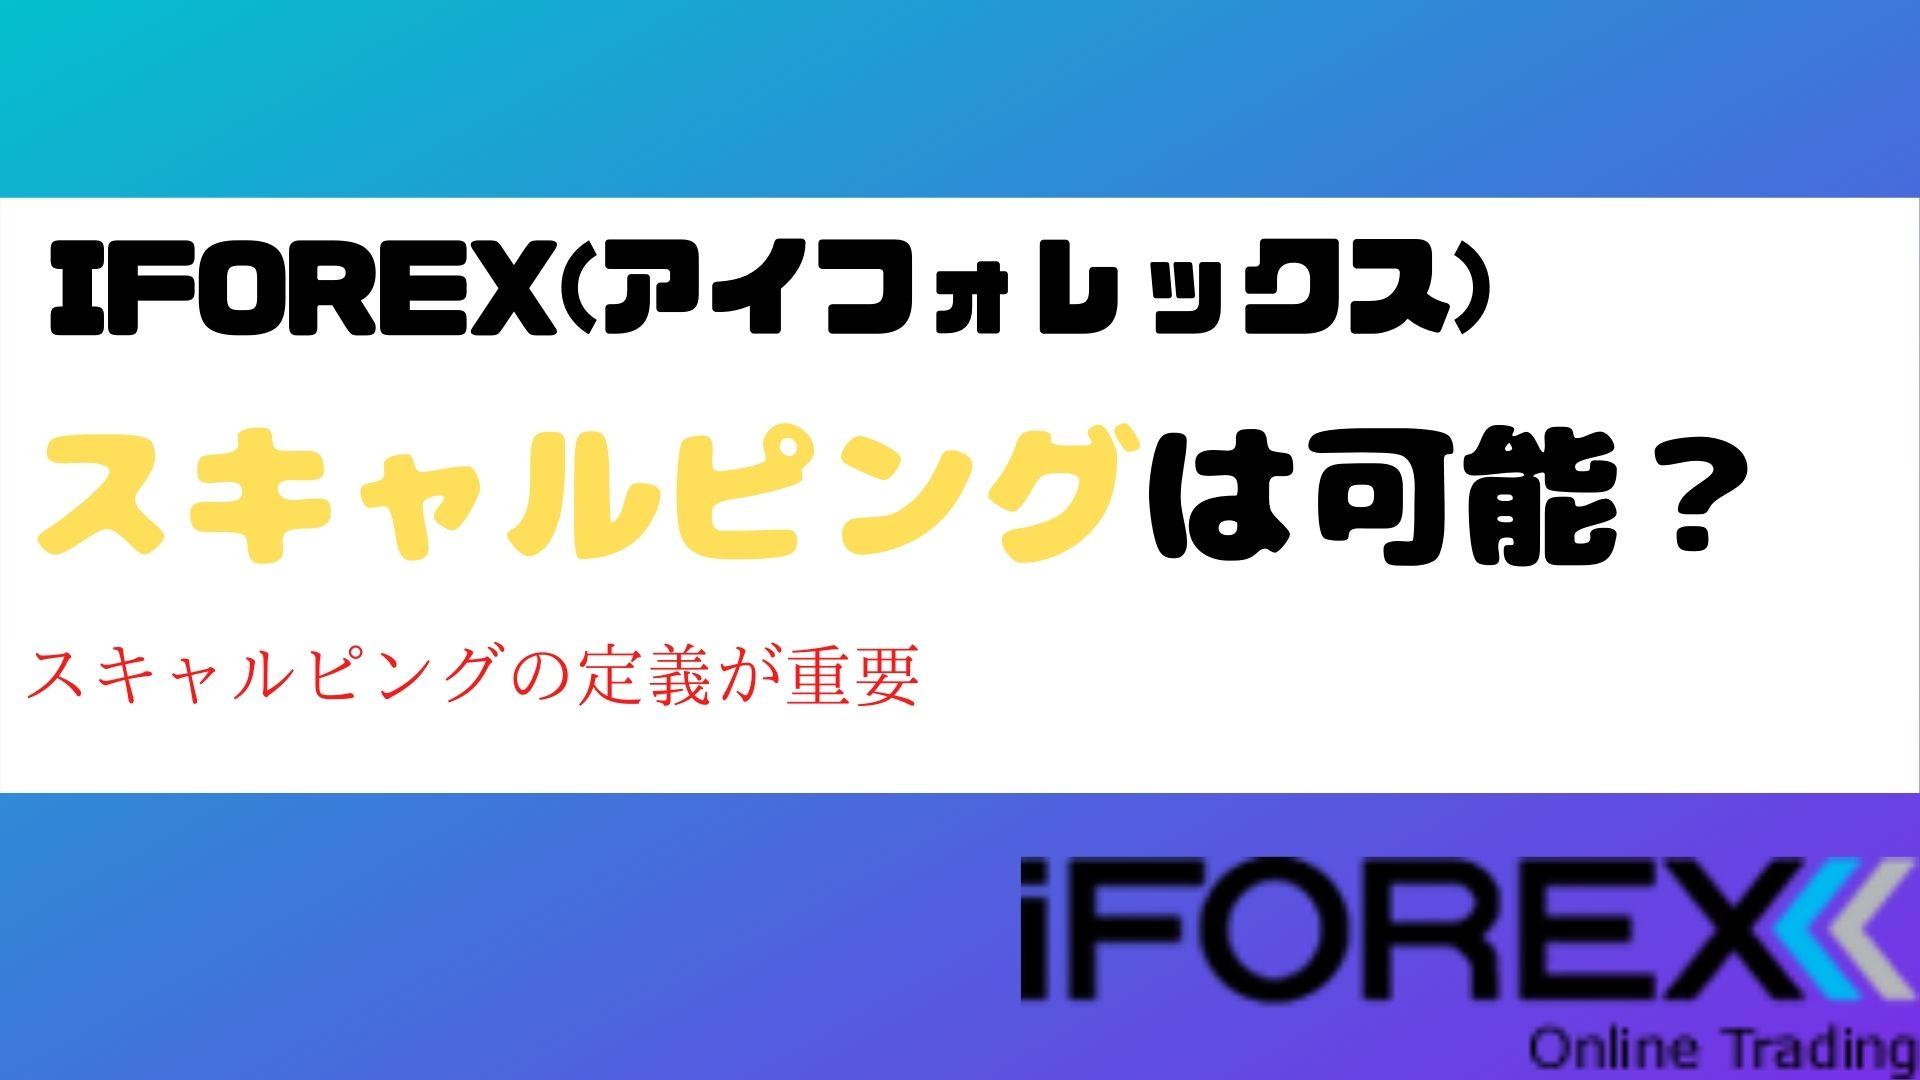 iforex-scalping-title